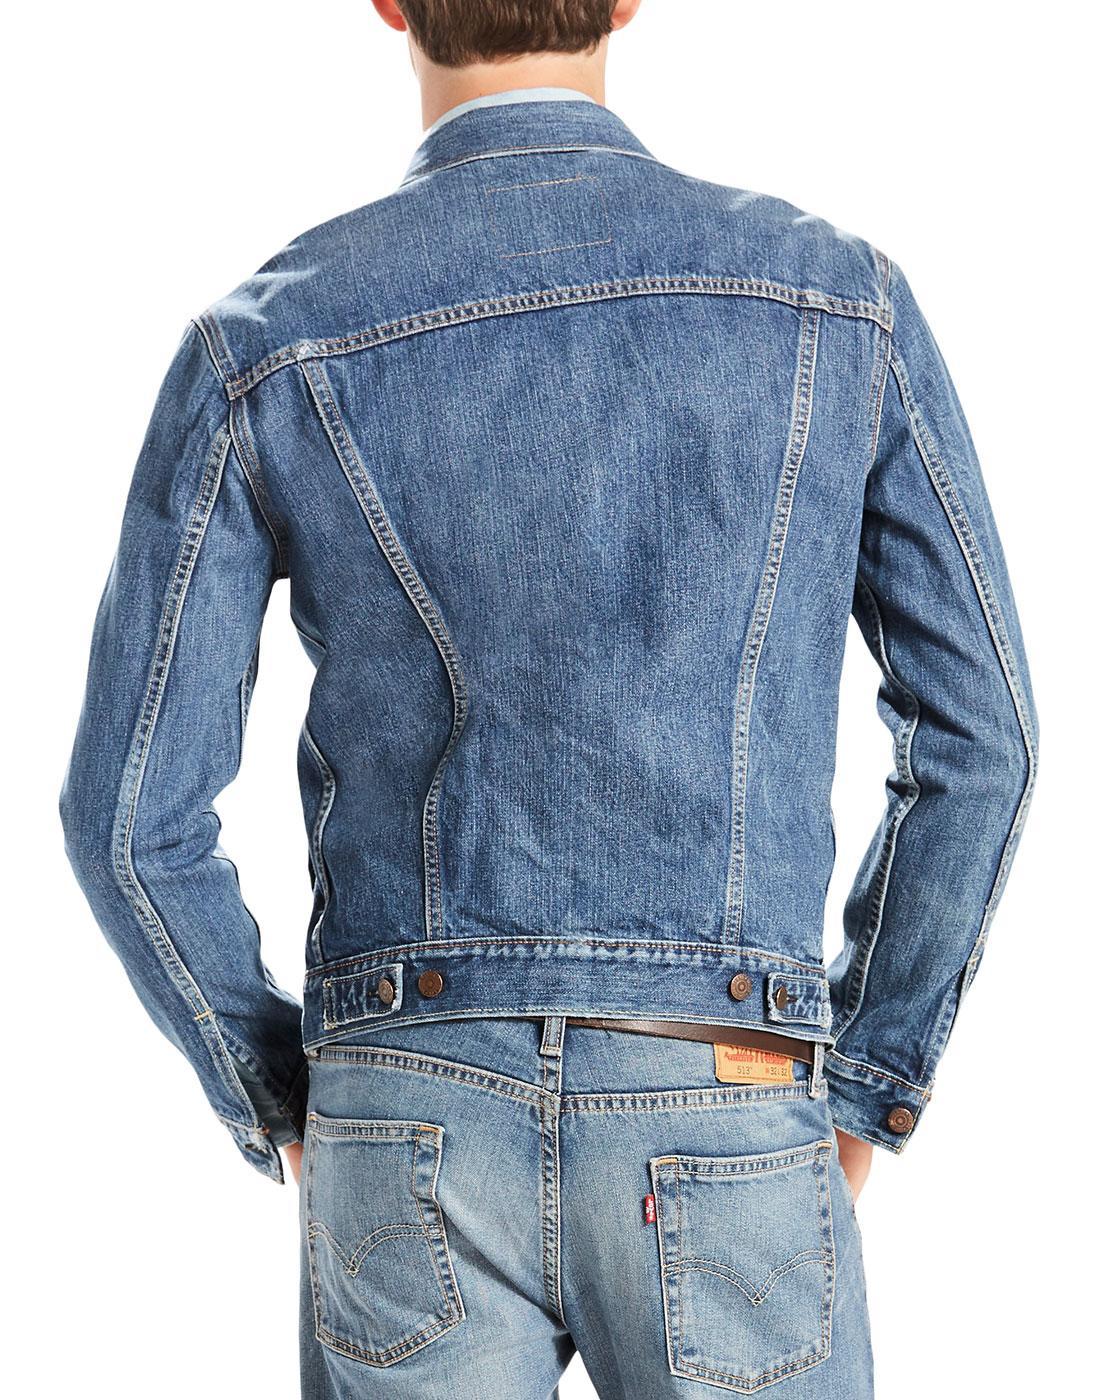 ff755ff91 LEVI'S 511 Stonewash Denim Jeans (OCEAN PARKWAY)